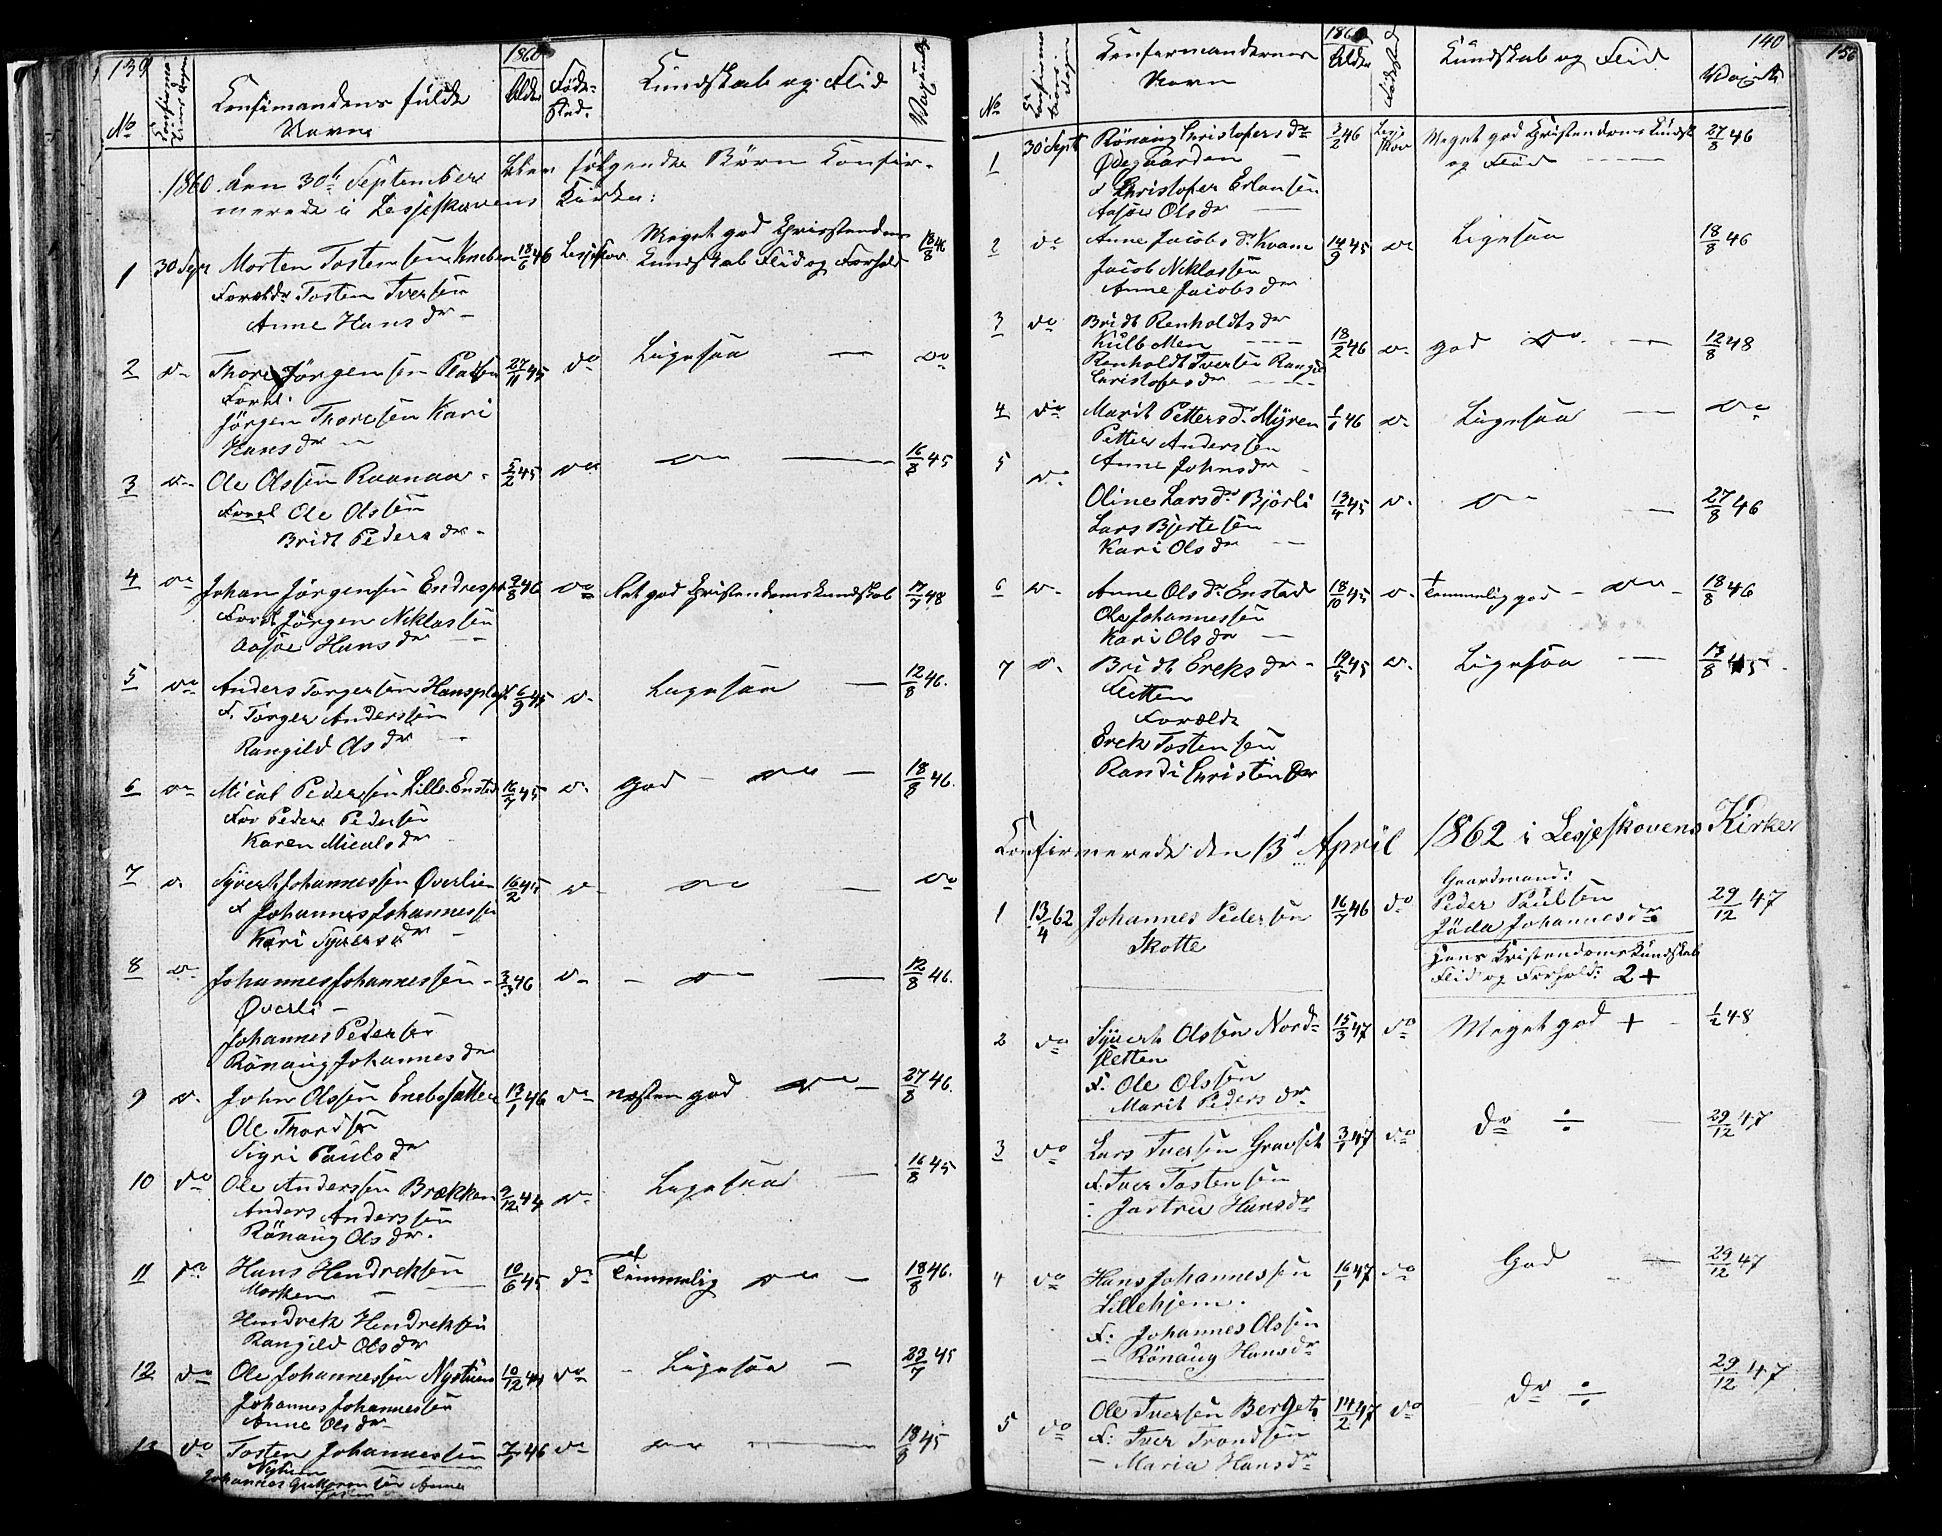 SAH, Lesja prestekontor, Klokkerbok nr. 4, 1842-1871, s. 139-140